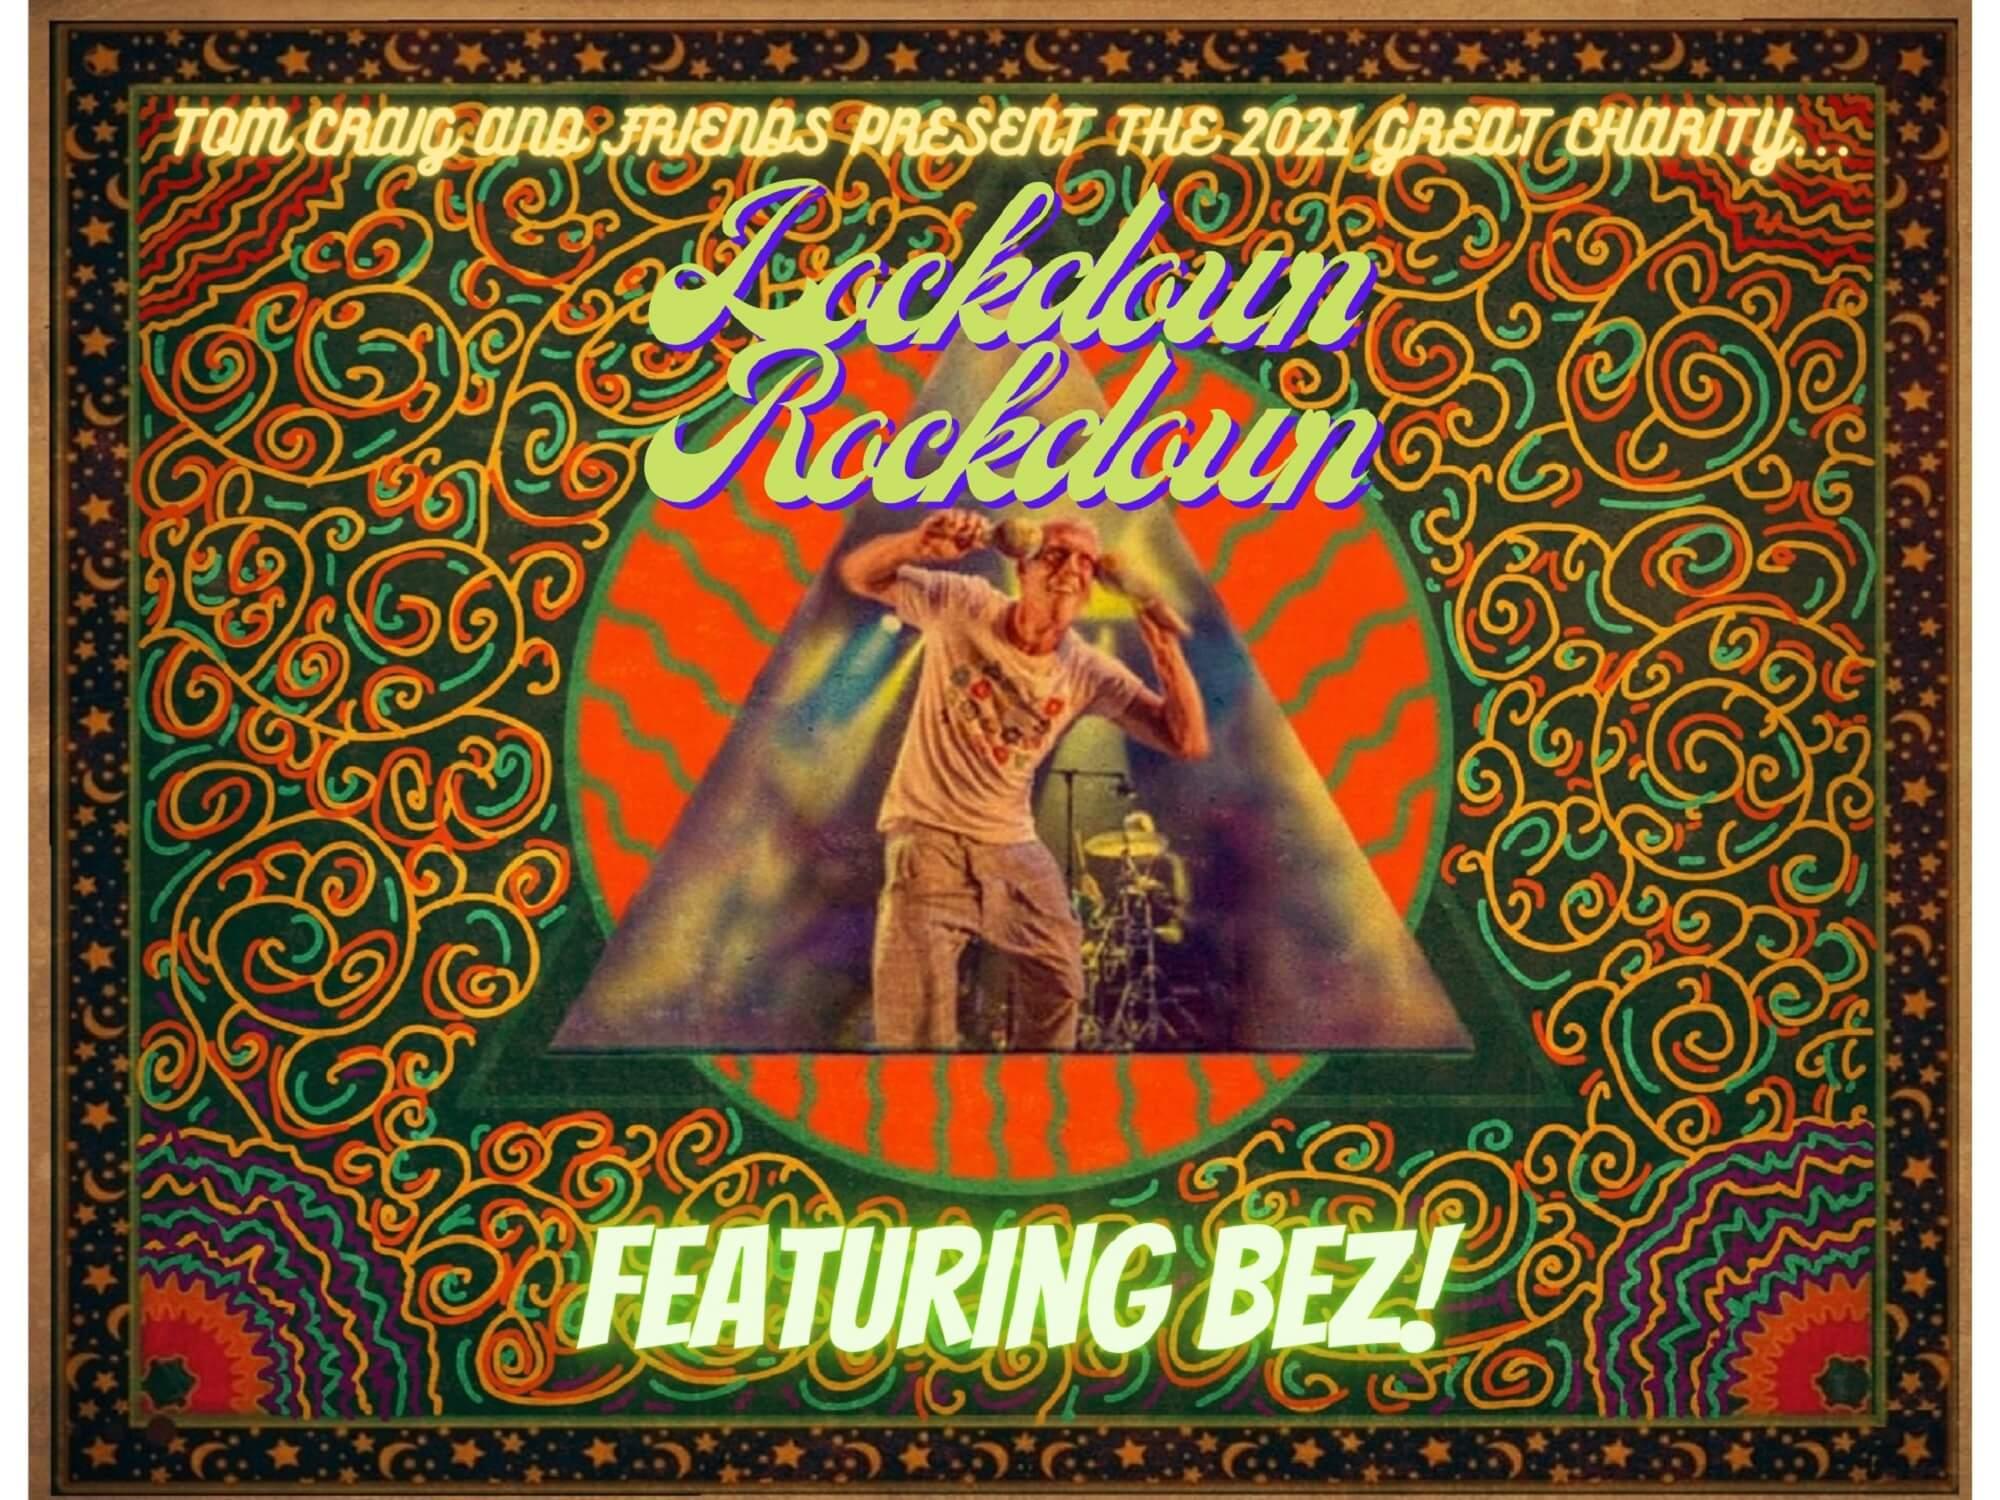 The Lockdown Rockdown charity single video on YouTube